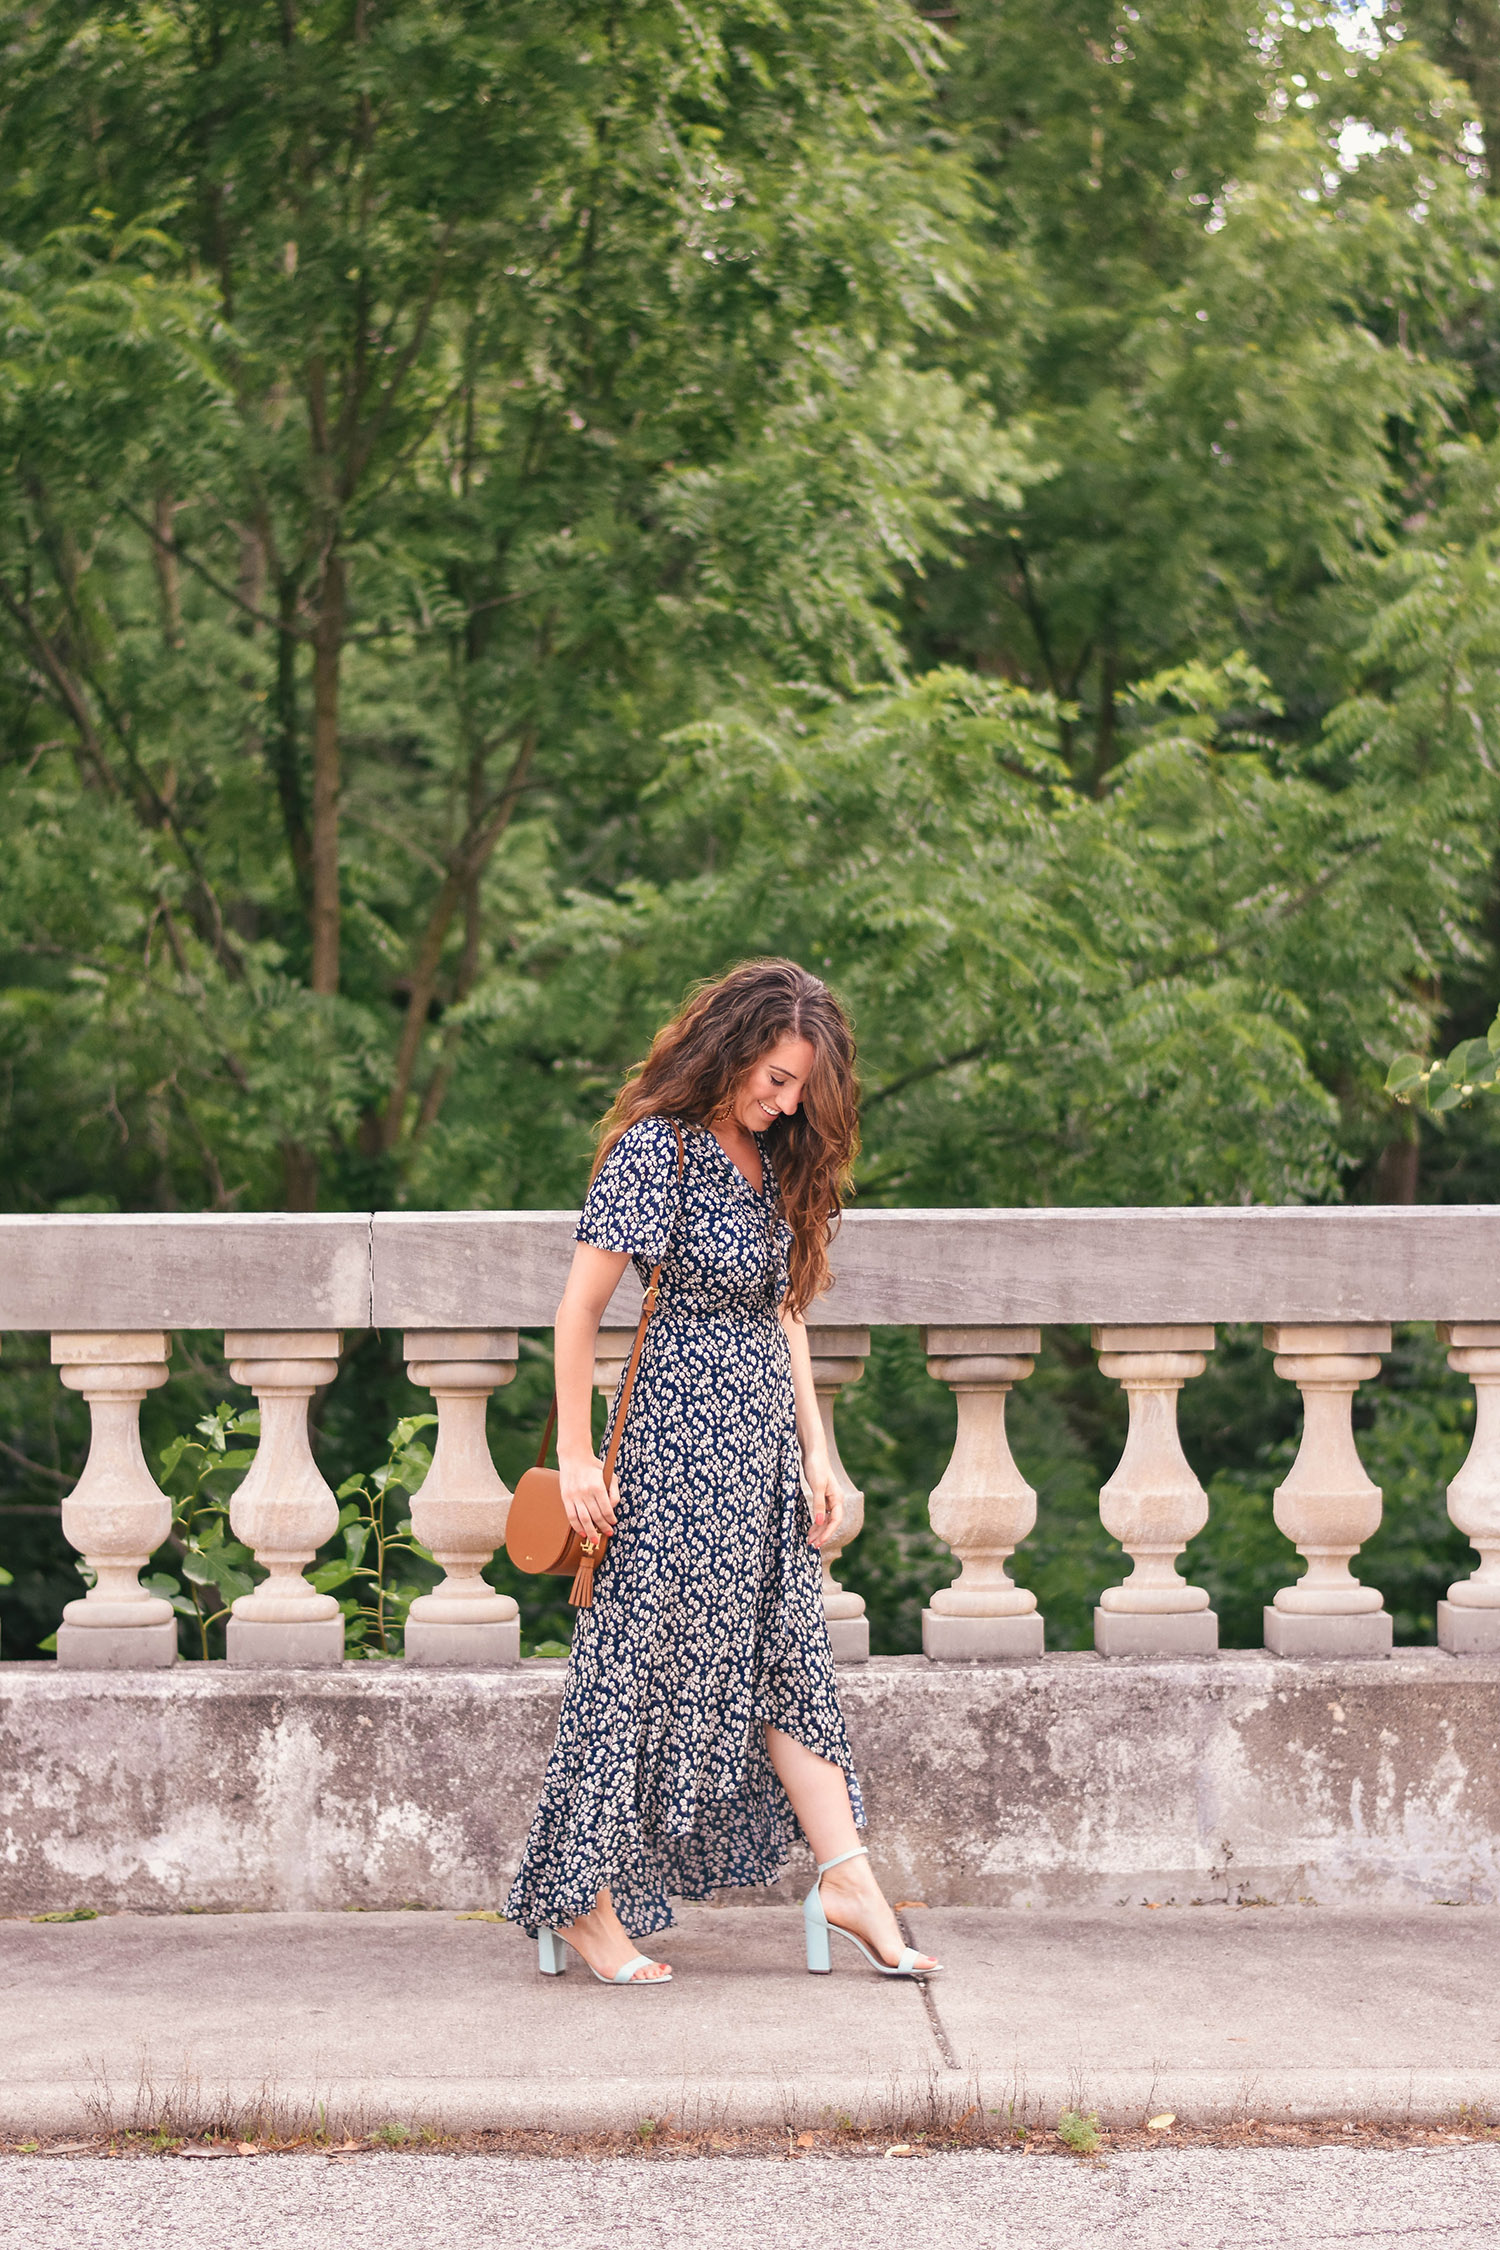 Lily & Sparrow Boutique dress  // Anthropologie earrings [ floral  /  gold  / similar ] //  Madden Girl heels [ similar ]// Lauren by Ralph Lauren bag [ similar /  love this one ]